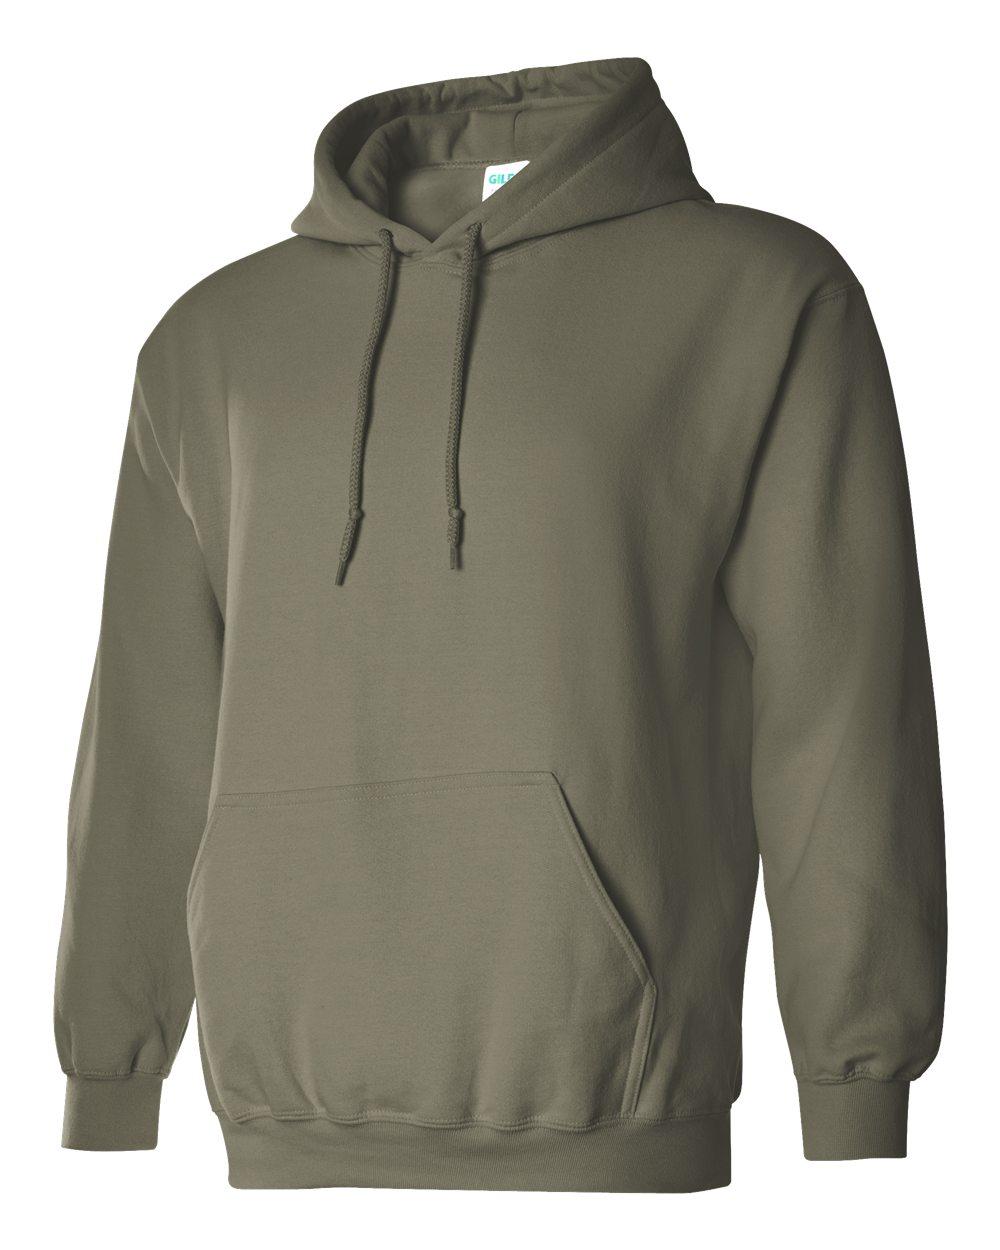 Gildan Heavy Blend Hooded Sweatshirt GI18500 Military Green